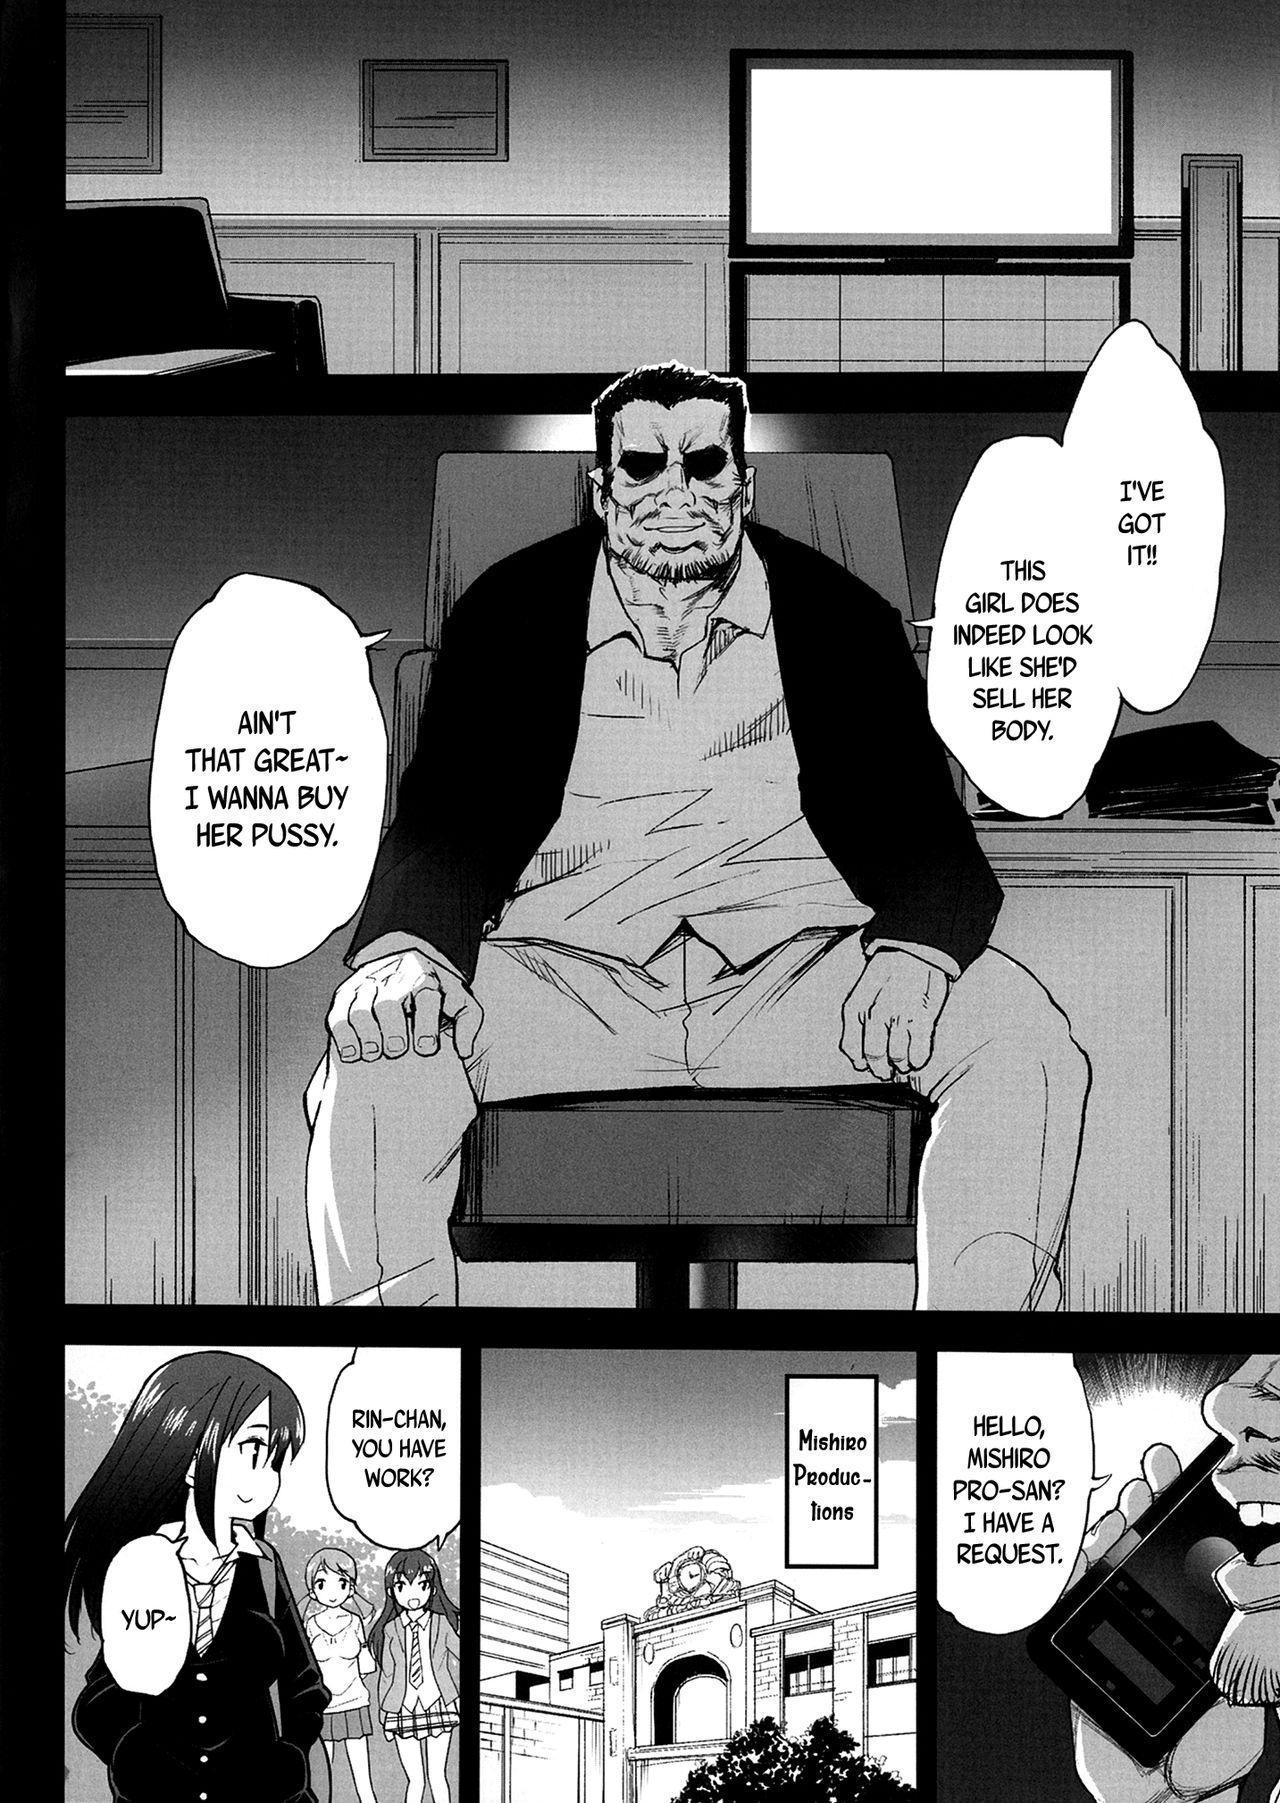 [Eromazun (Ma-kurou)] Shibuya Rin, Ochiru ~Ossan ga Shibuya Rin to Enkou Sex~   Shibuya Rin Falls ~An Old Guy Has Paid Sex With Shibuya Rin~ (THE IDOLM@STER CINDERELLA GIRLS) [English] [B.E.C. Scans] [Digital] 2